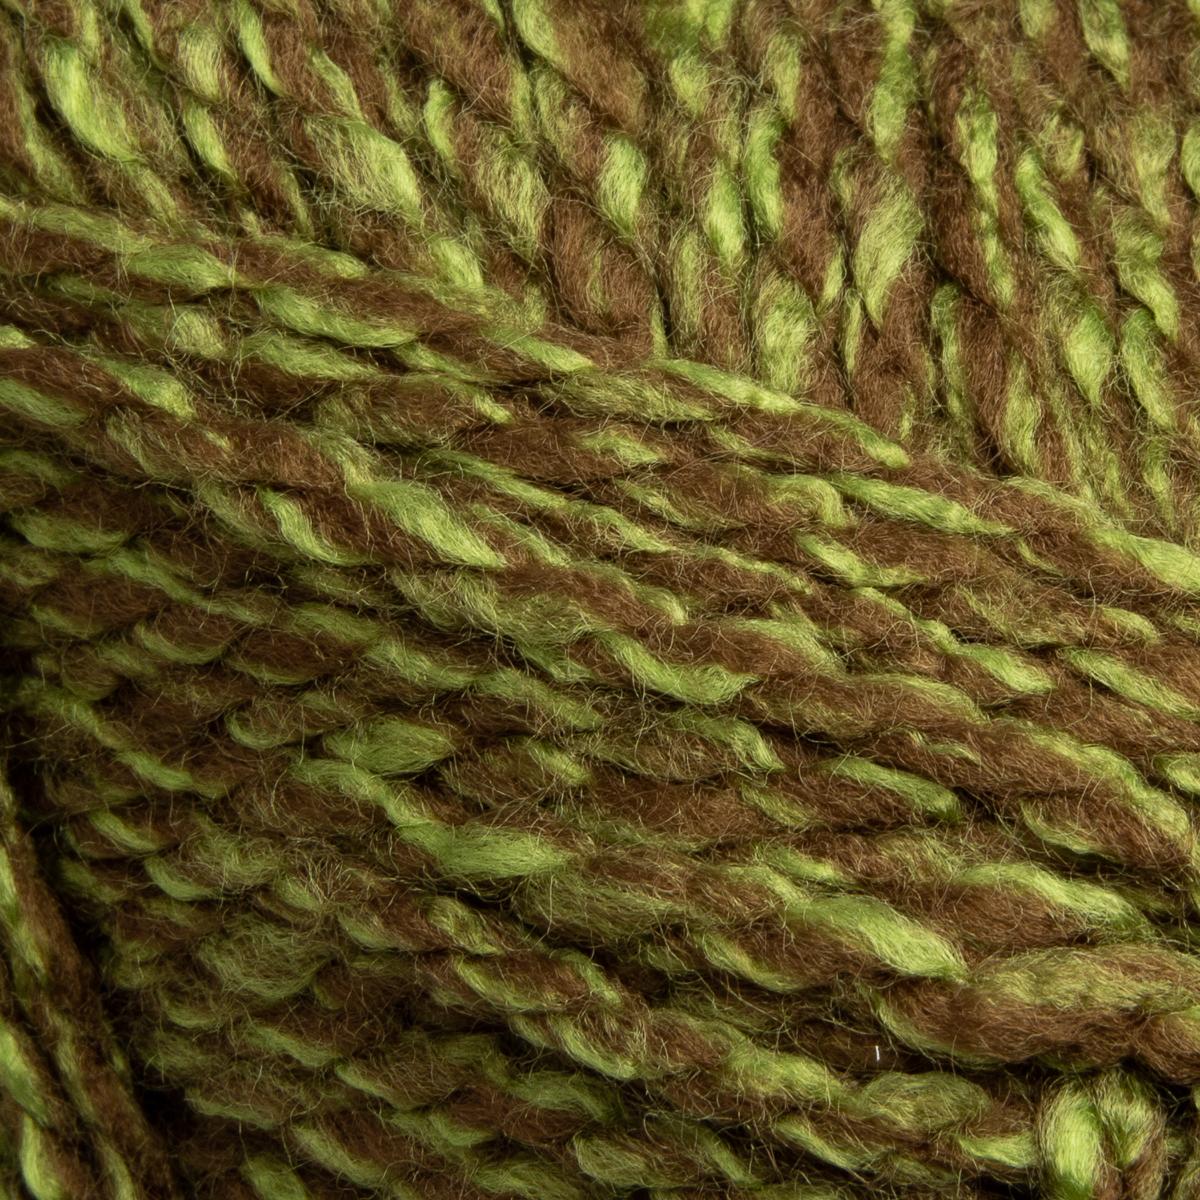 3pk-Premier-Yarns-Deborah-Norville-Serenity-100-Acrylic-Yarn-Chunky-5-Knitting thumbnail 70